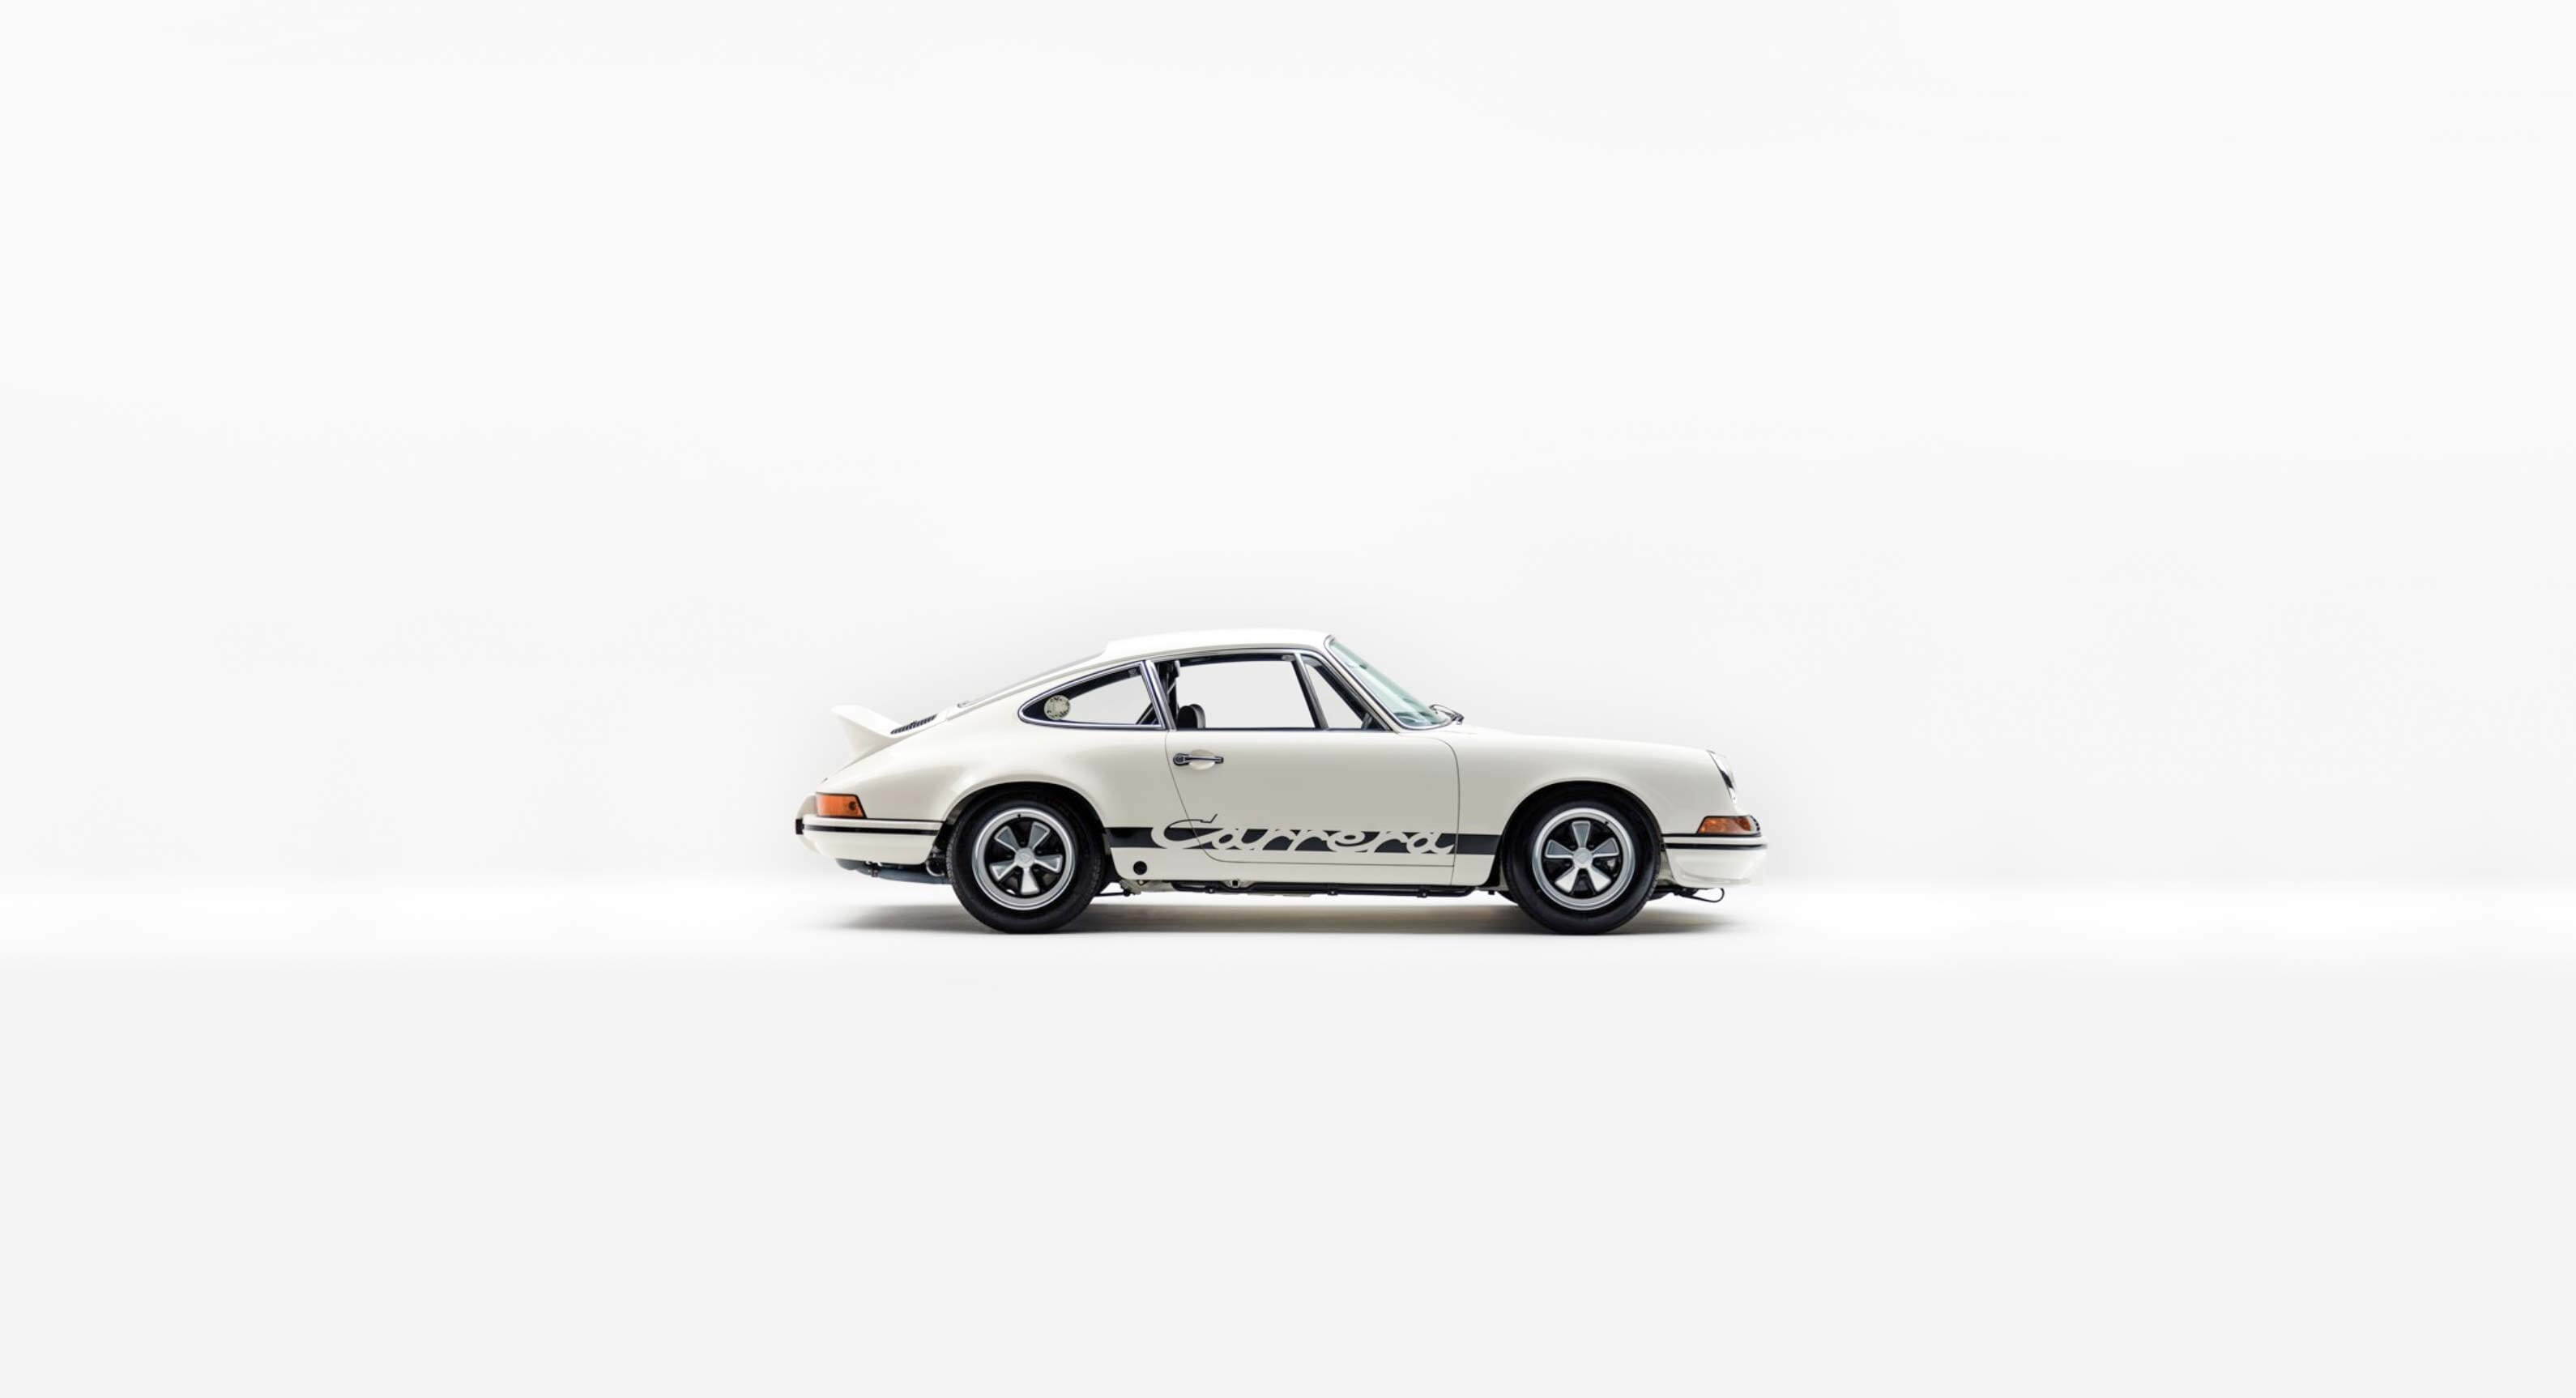 The 2.7 Million Pounds 911 Carrera RSH 2.7